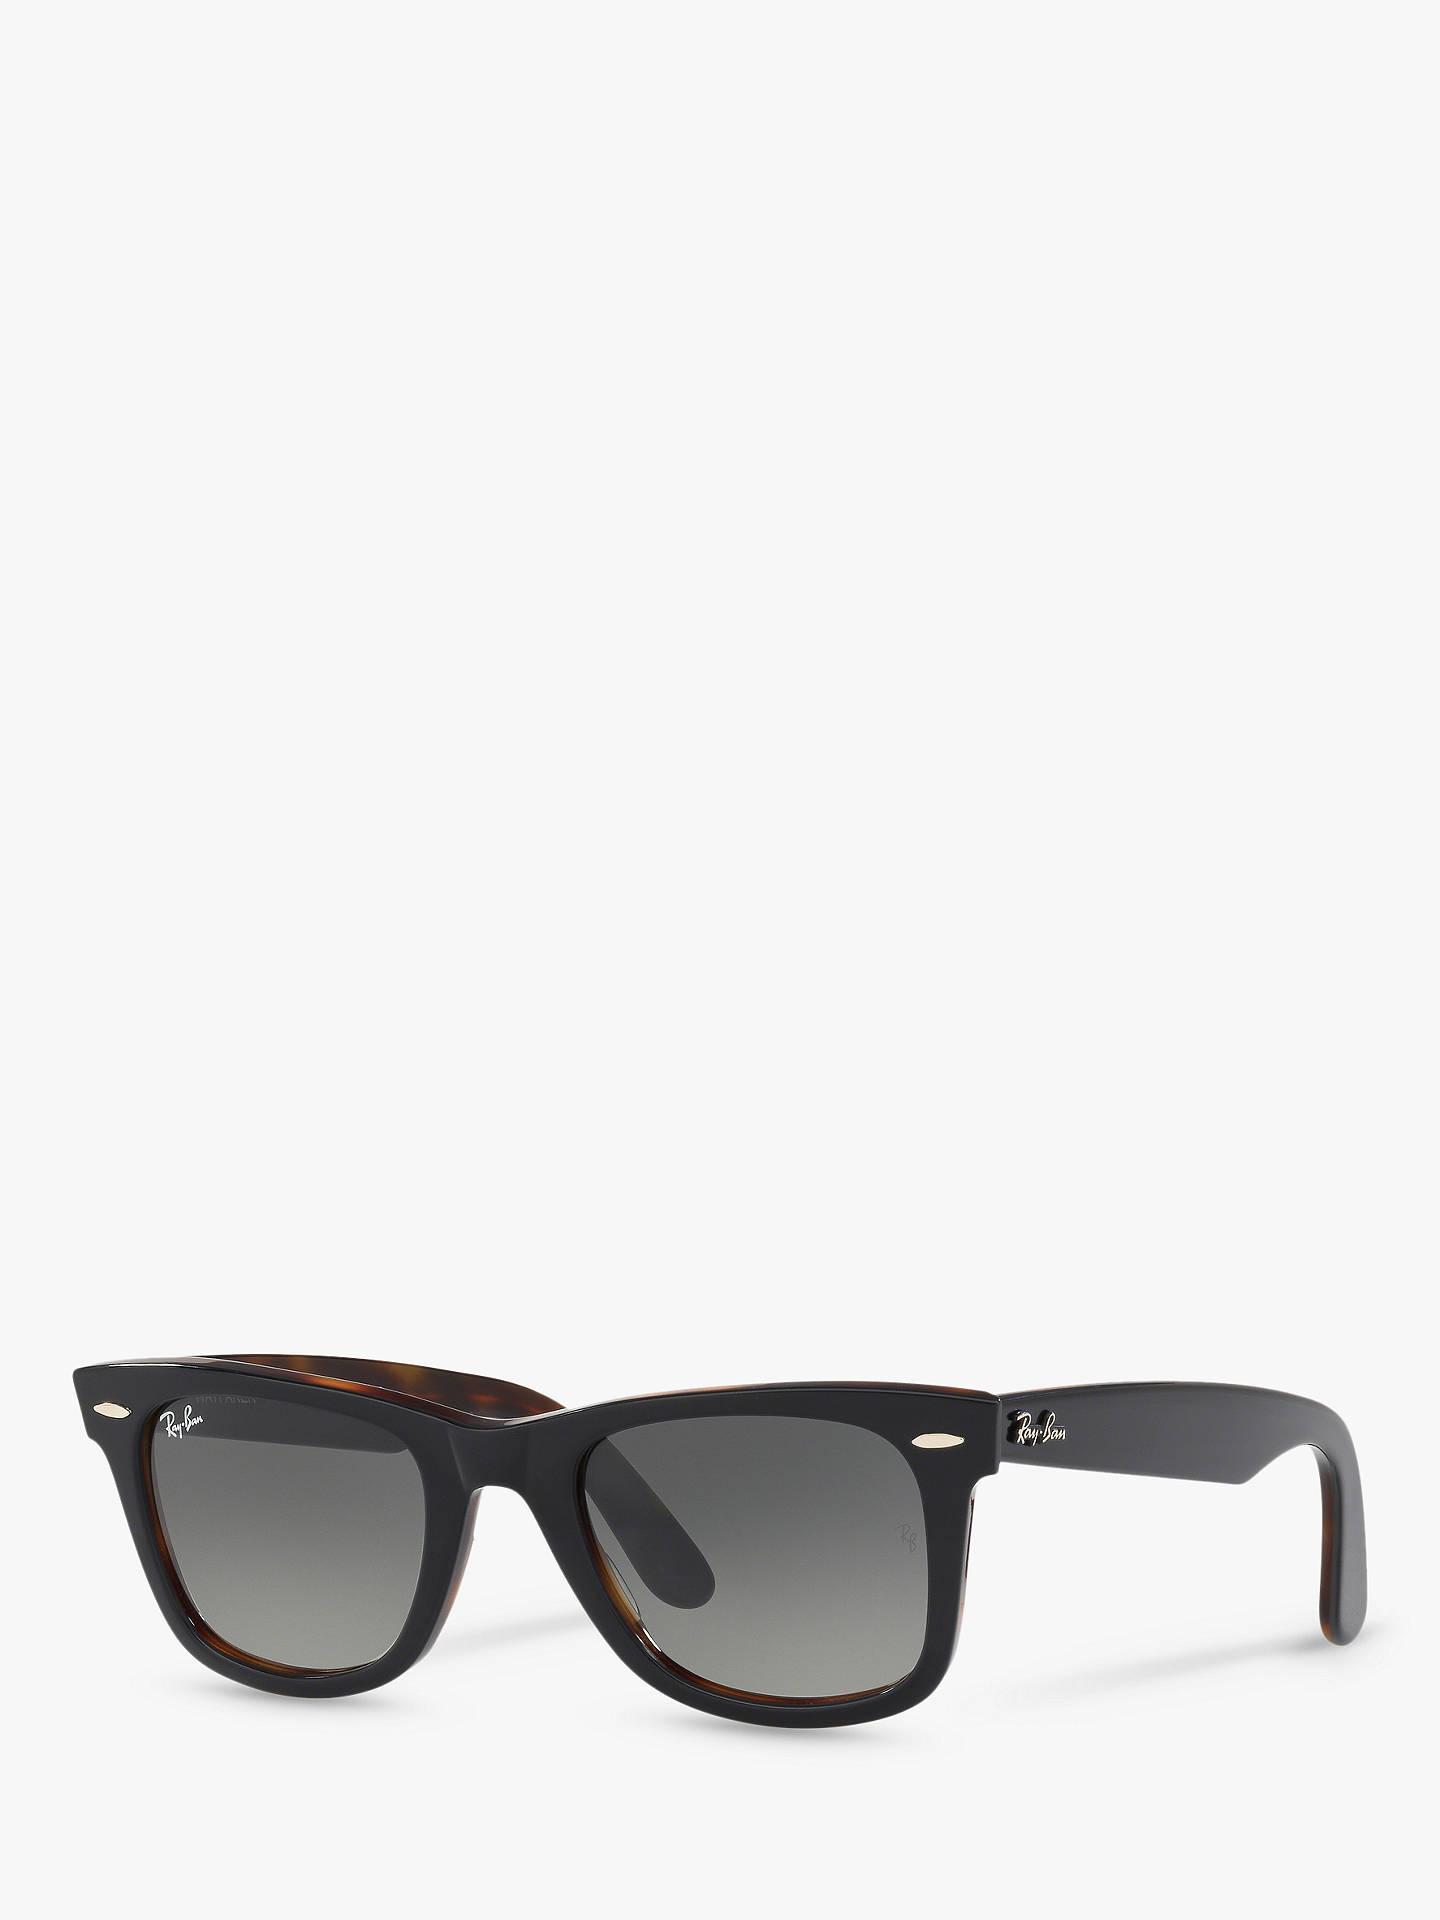 ef1f14d56 Buy Ray-Ban RB2140 Women's Original Wayfarer Sunglasses, Grey/Grey Gradient  Online at ...